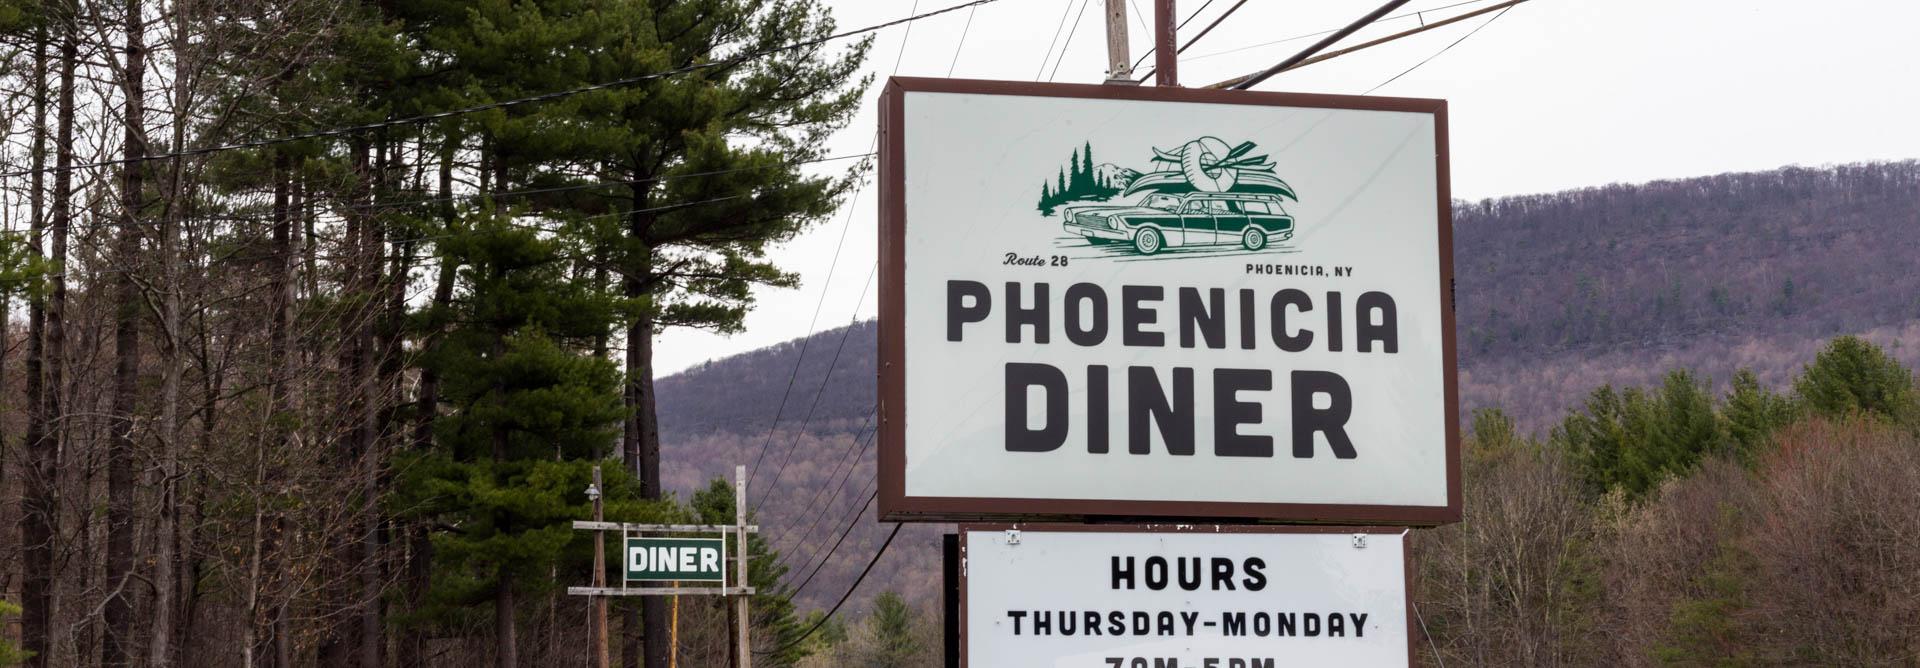 phoenicia_diner-3.jpg